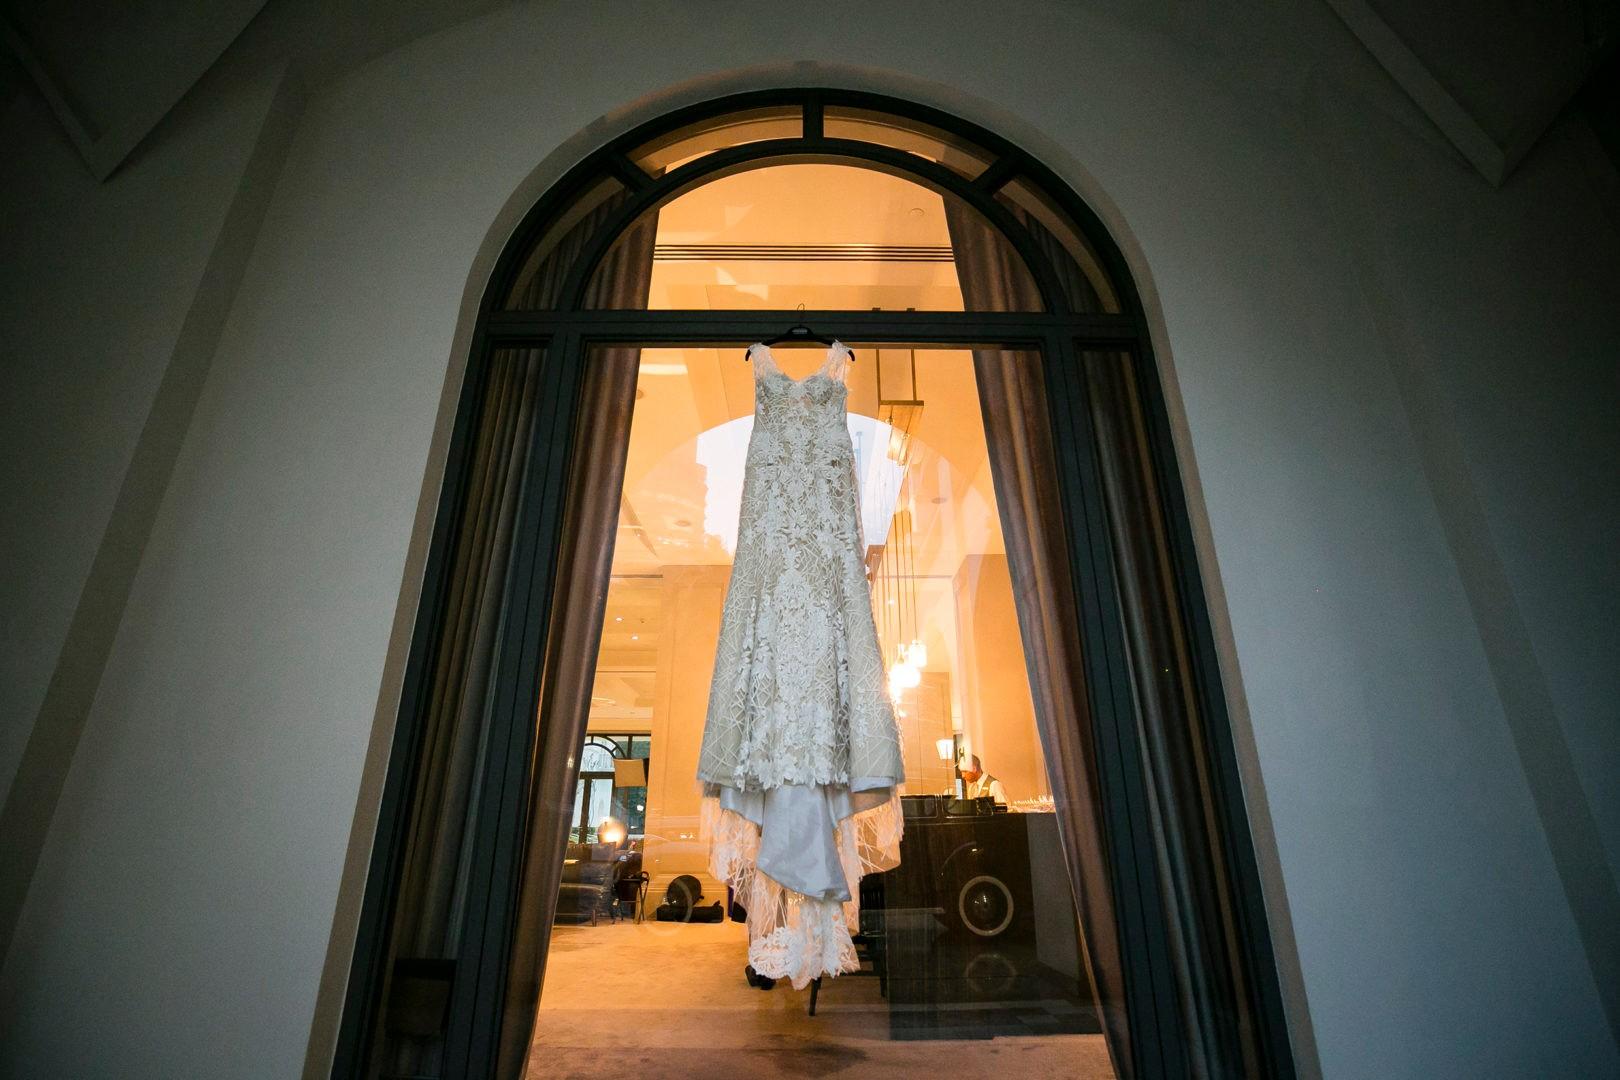 vestido da noiva pendurado antes do casamento